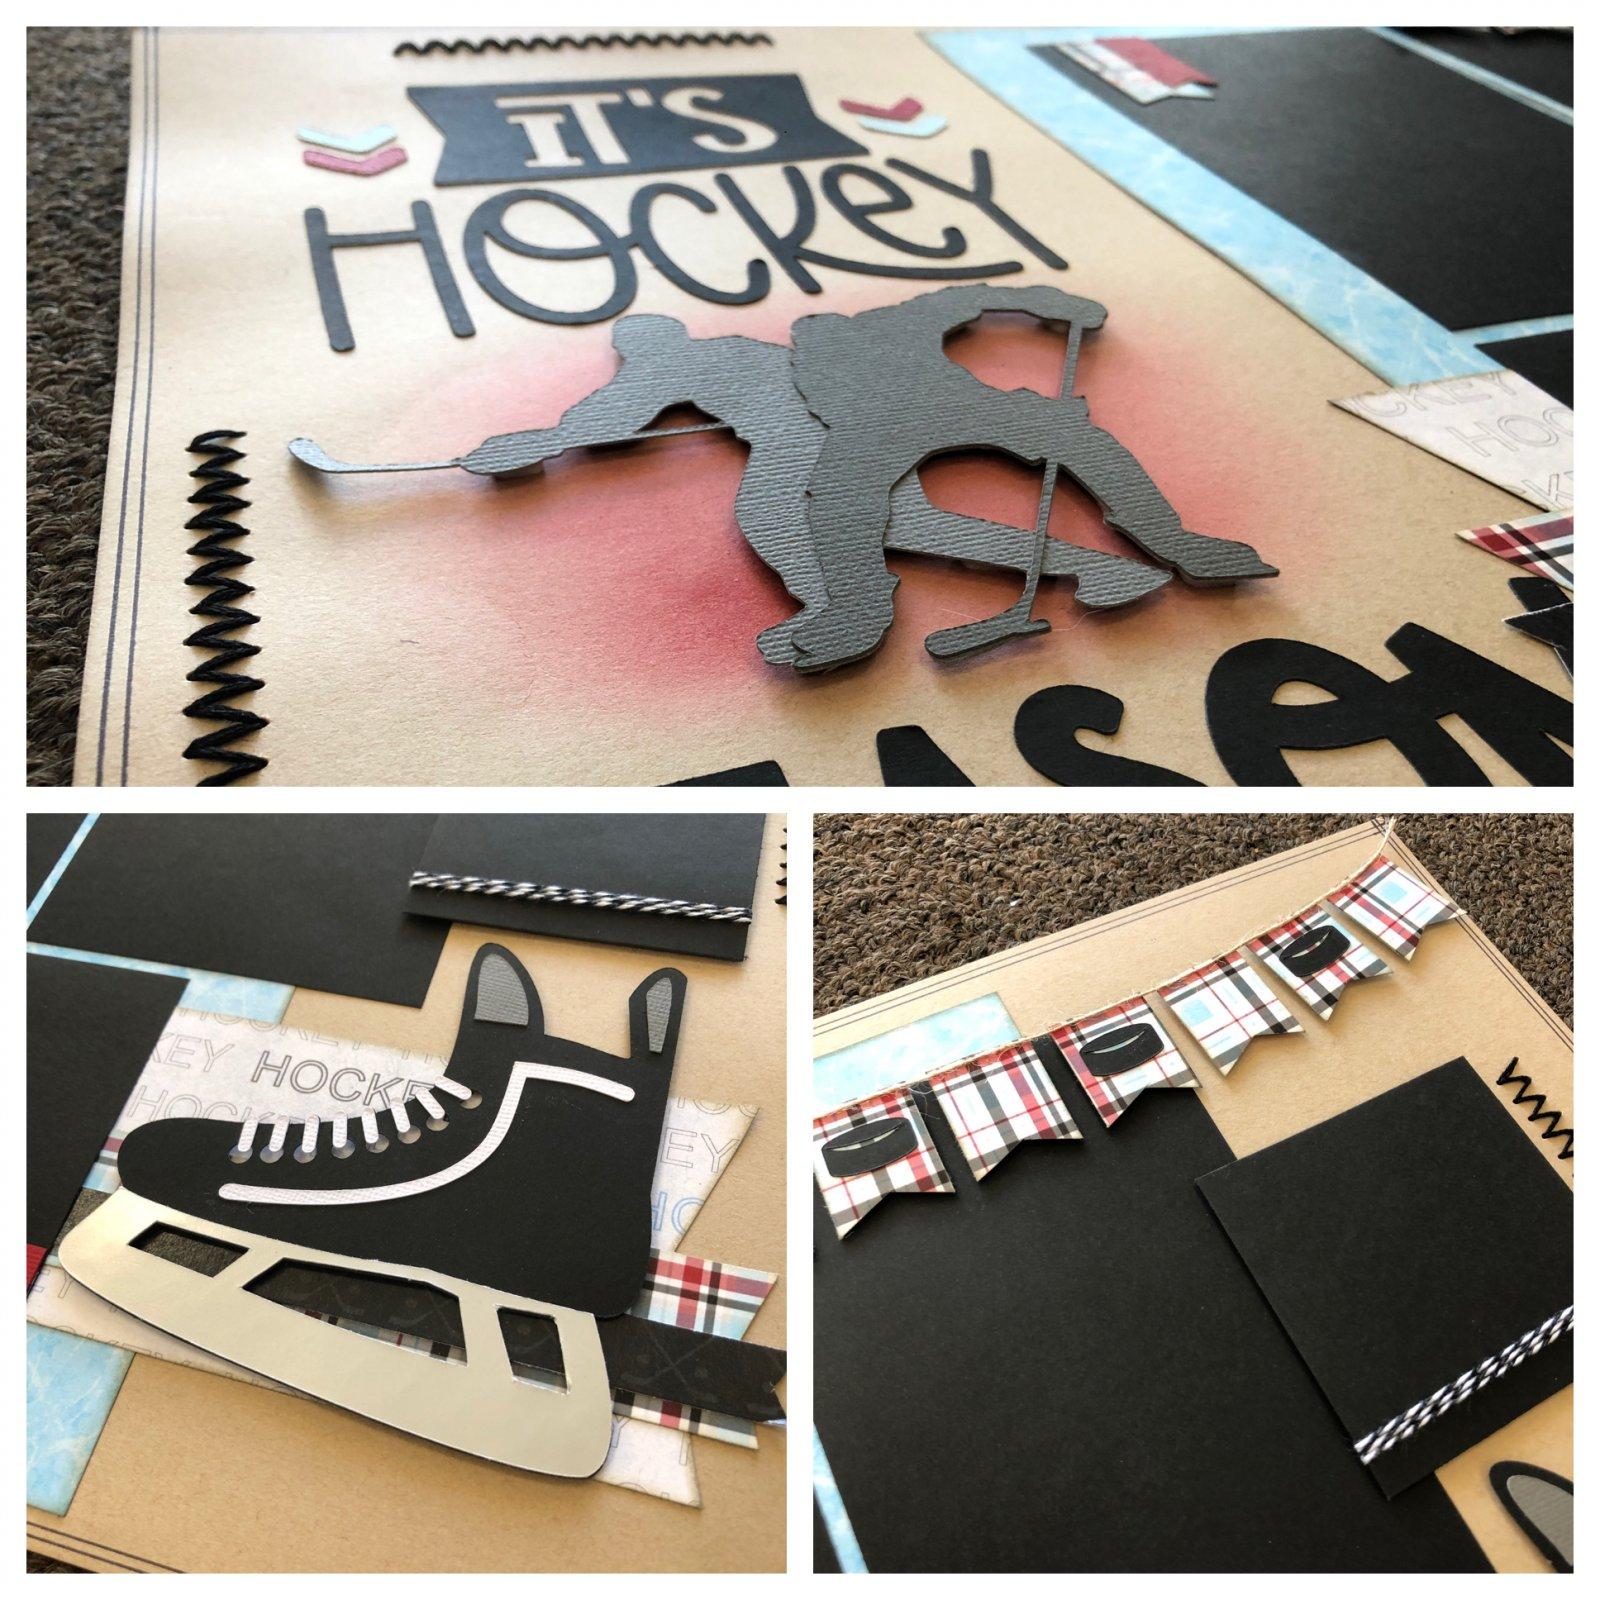 It's Hockey Season Kit